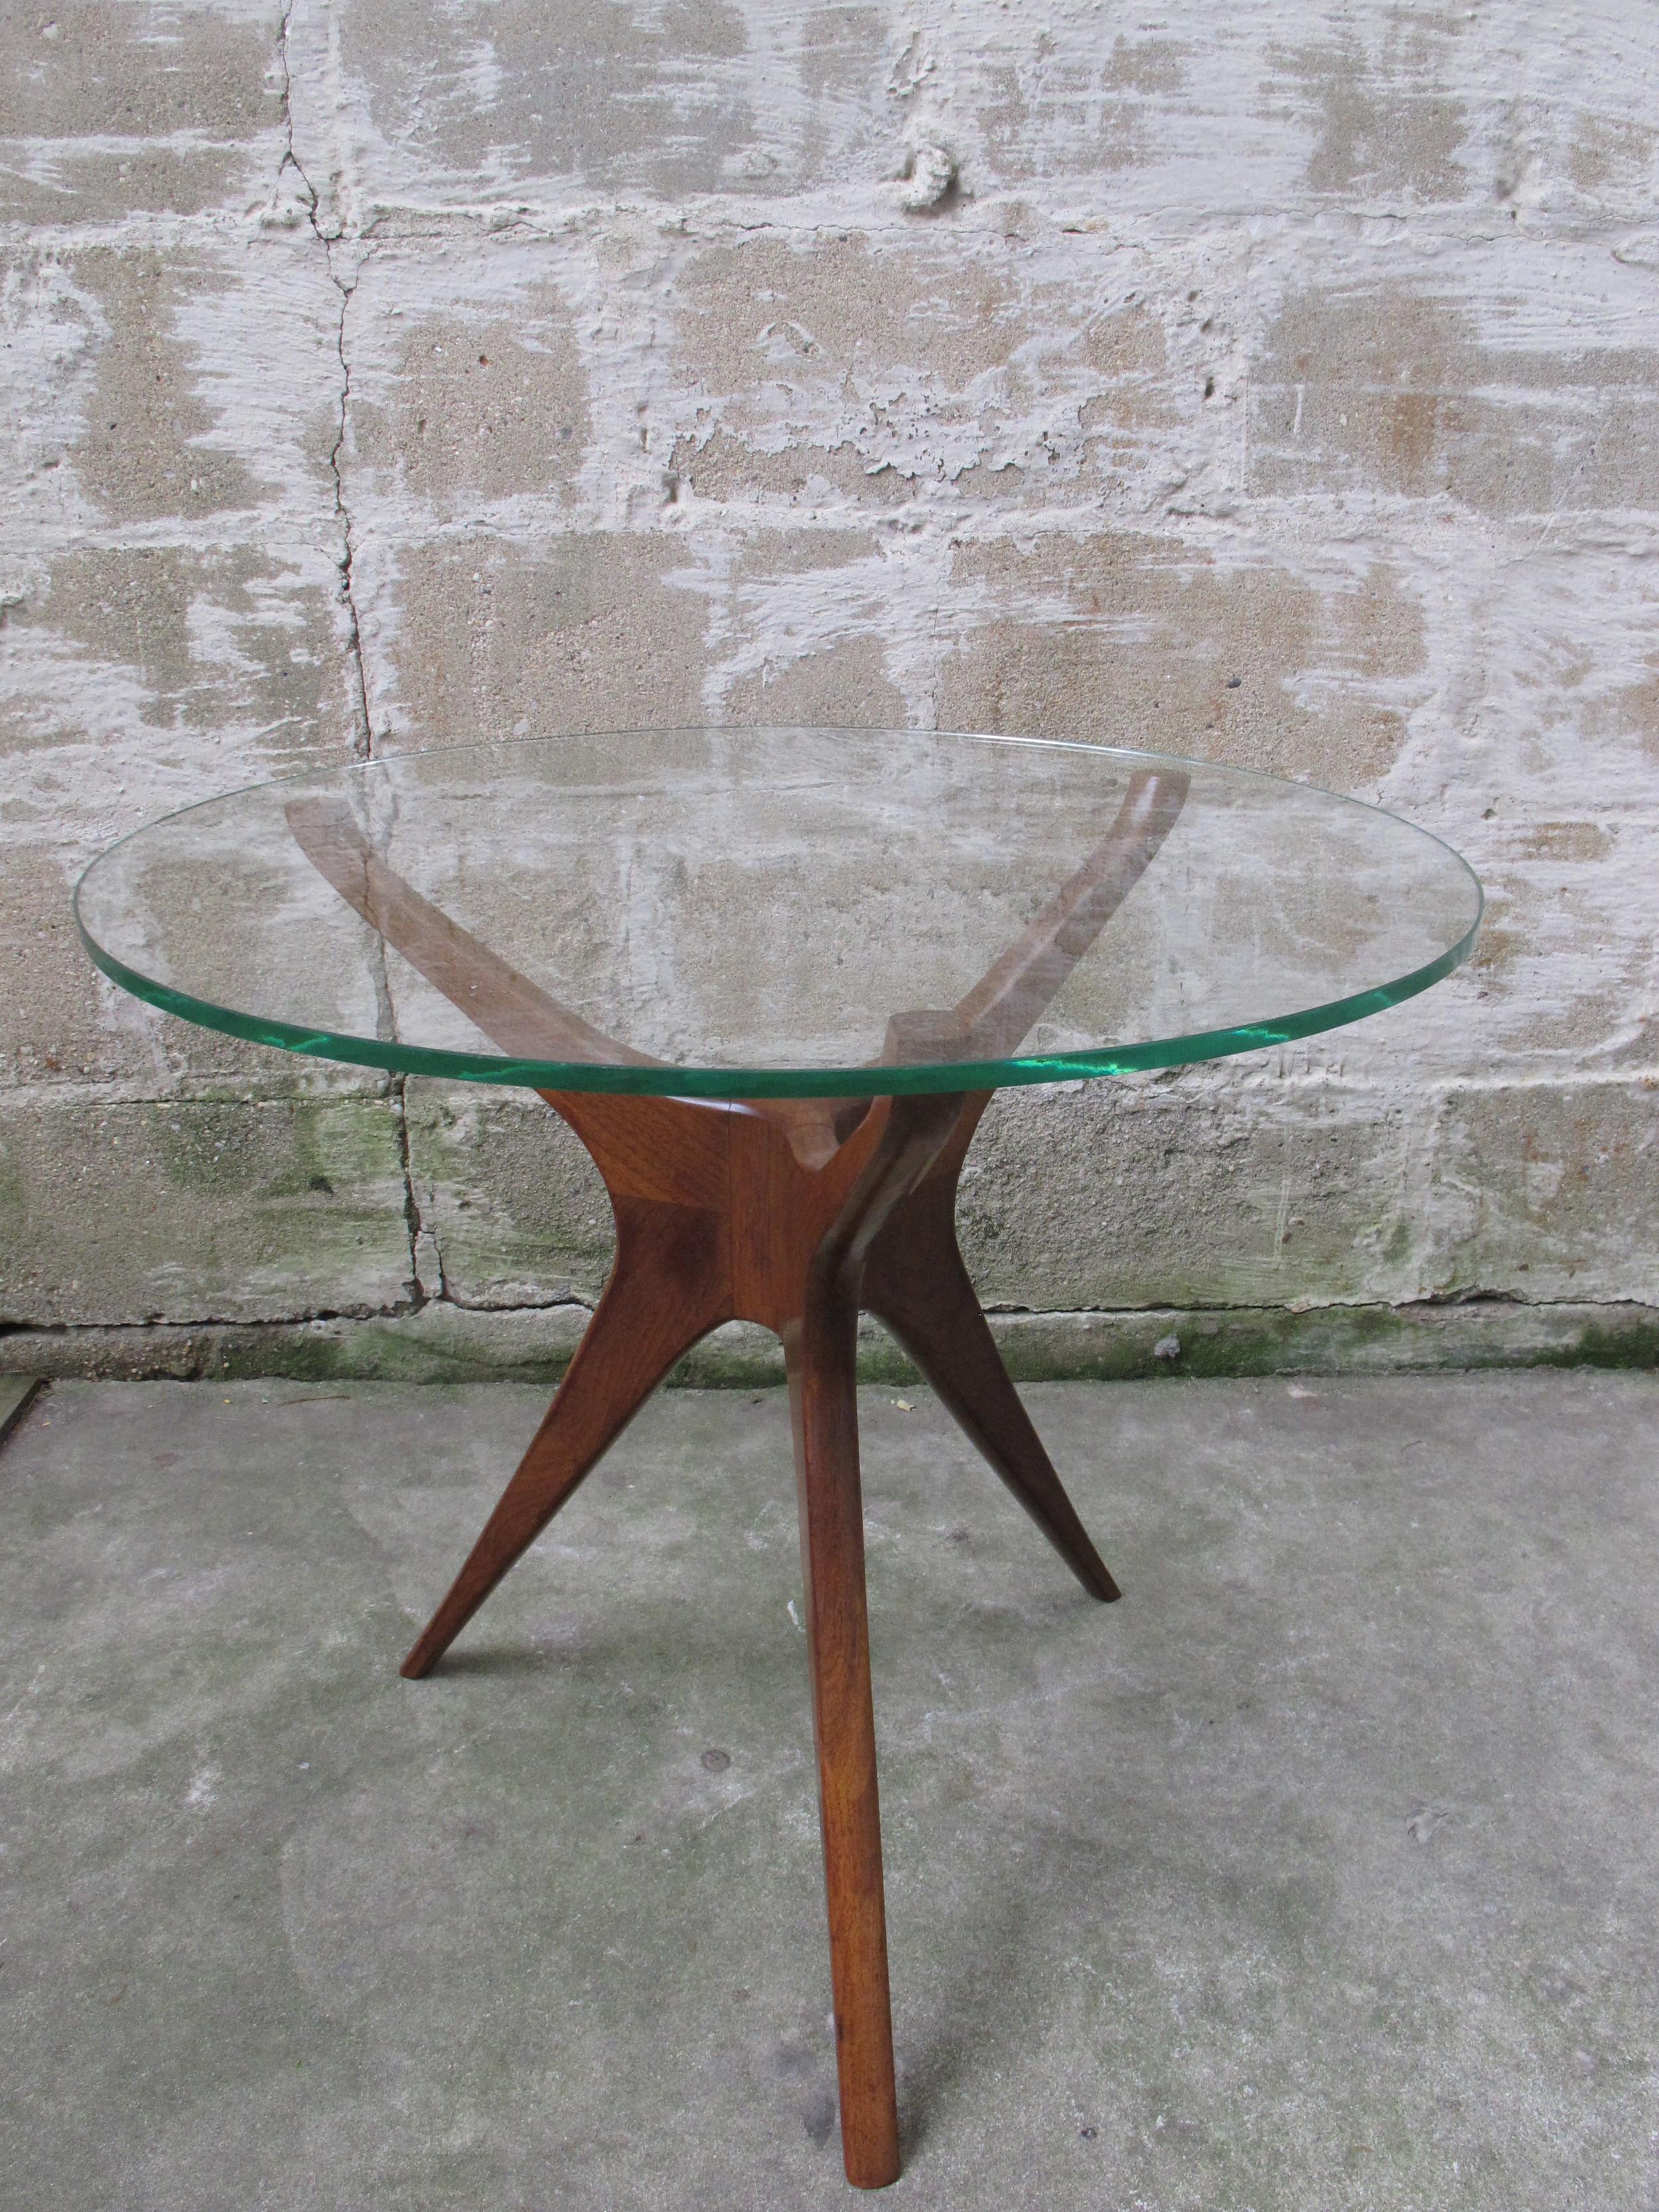 KAGAN STYLE MID CENTURY WALNUT & GLASS SIDE TABLE